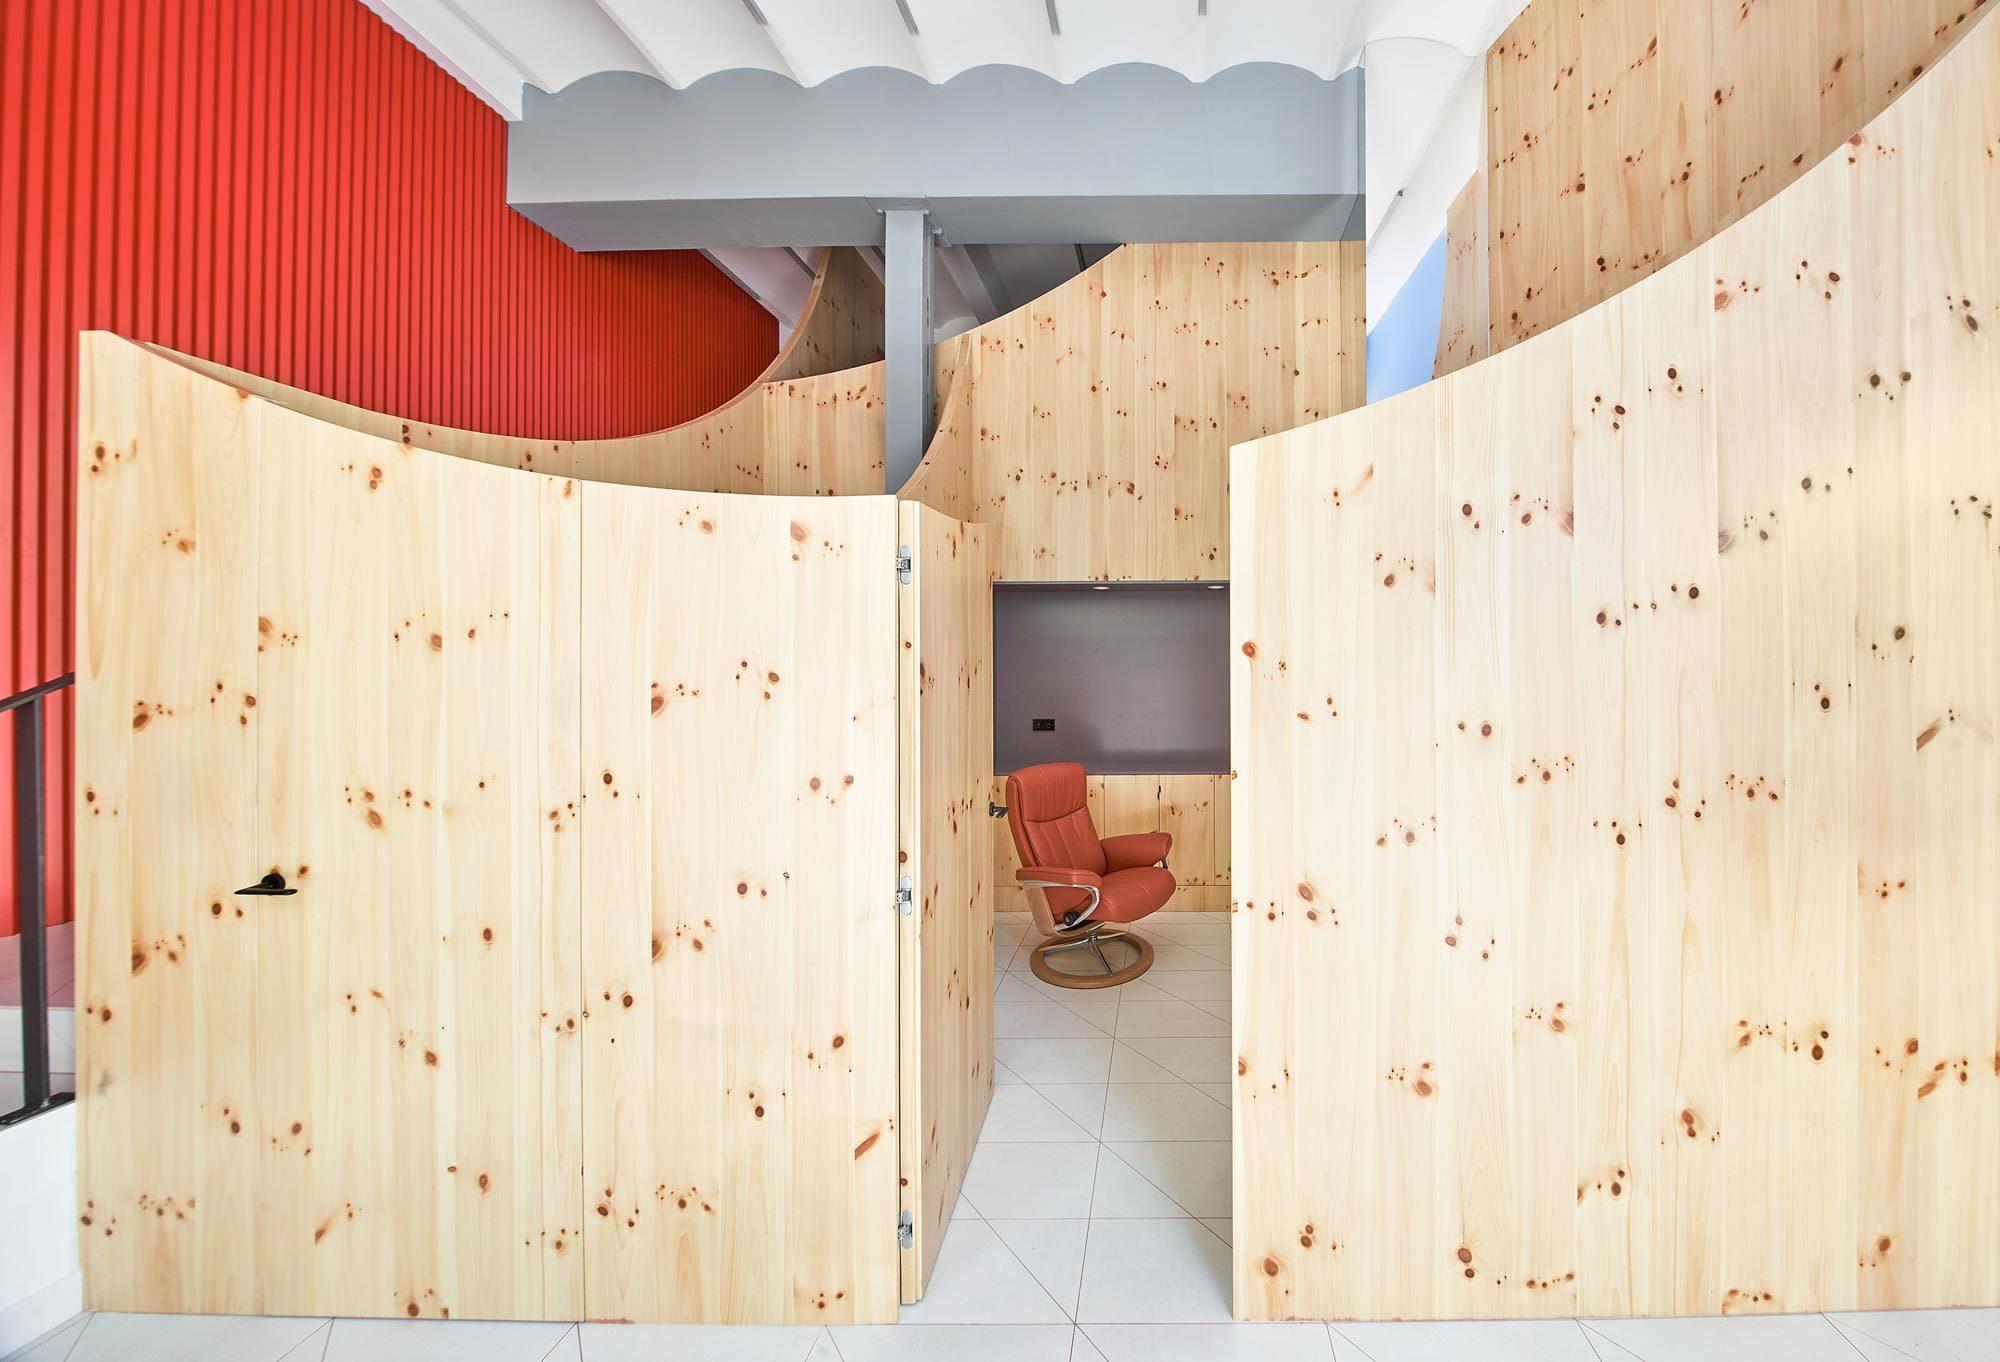 Impress Dental Clinic, Raul Sanchez Architects, Barcelona, Foto: José Hevia